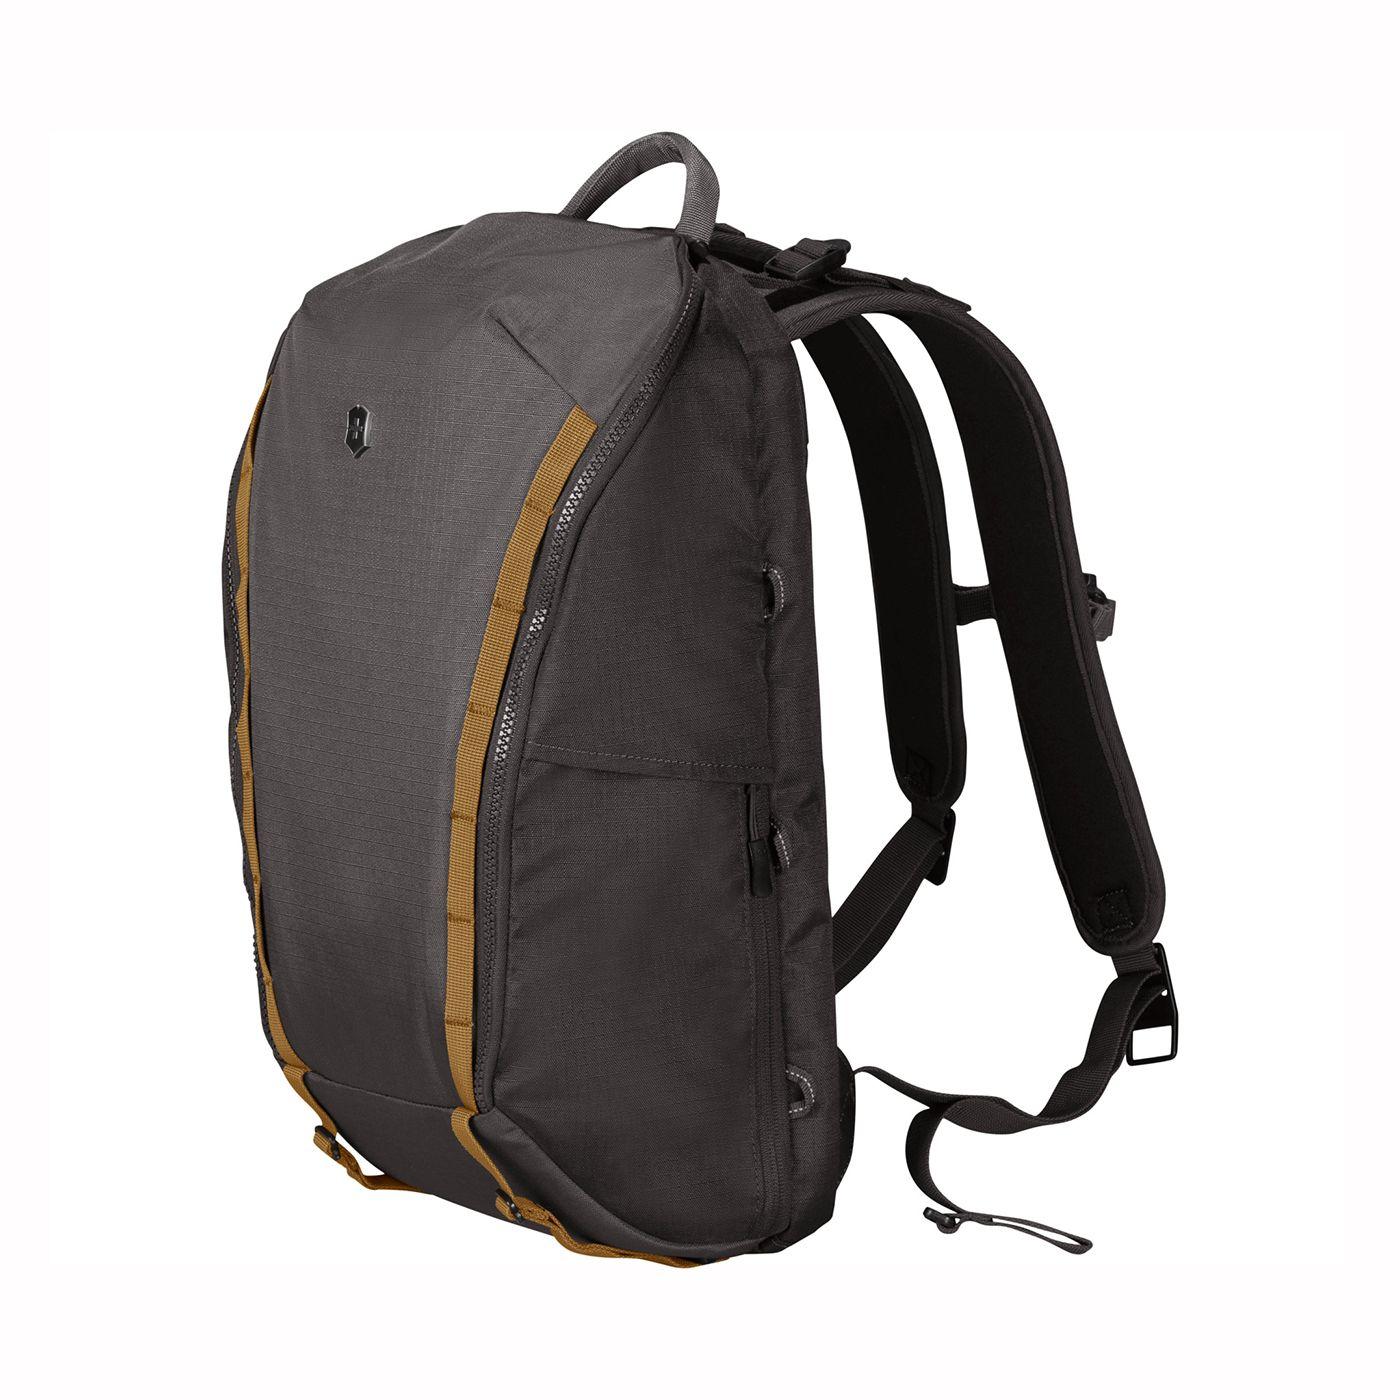 Daypack Notebooktasche Backpack unisex Vaude Amir Rucksack